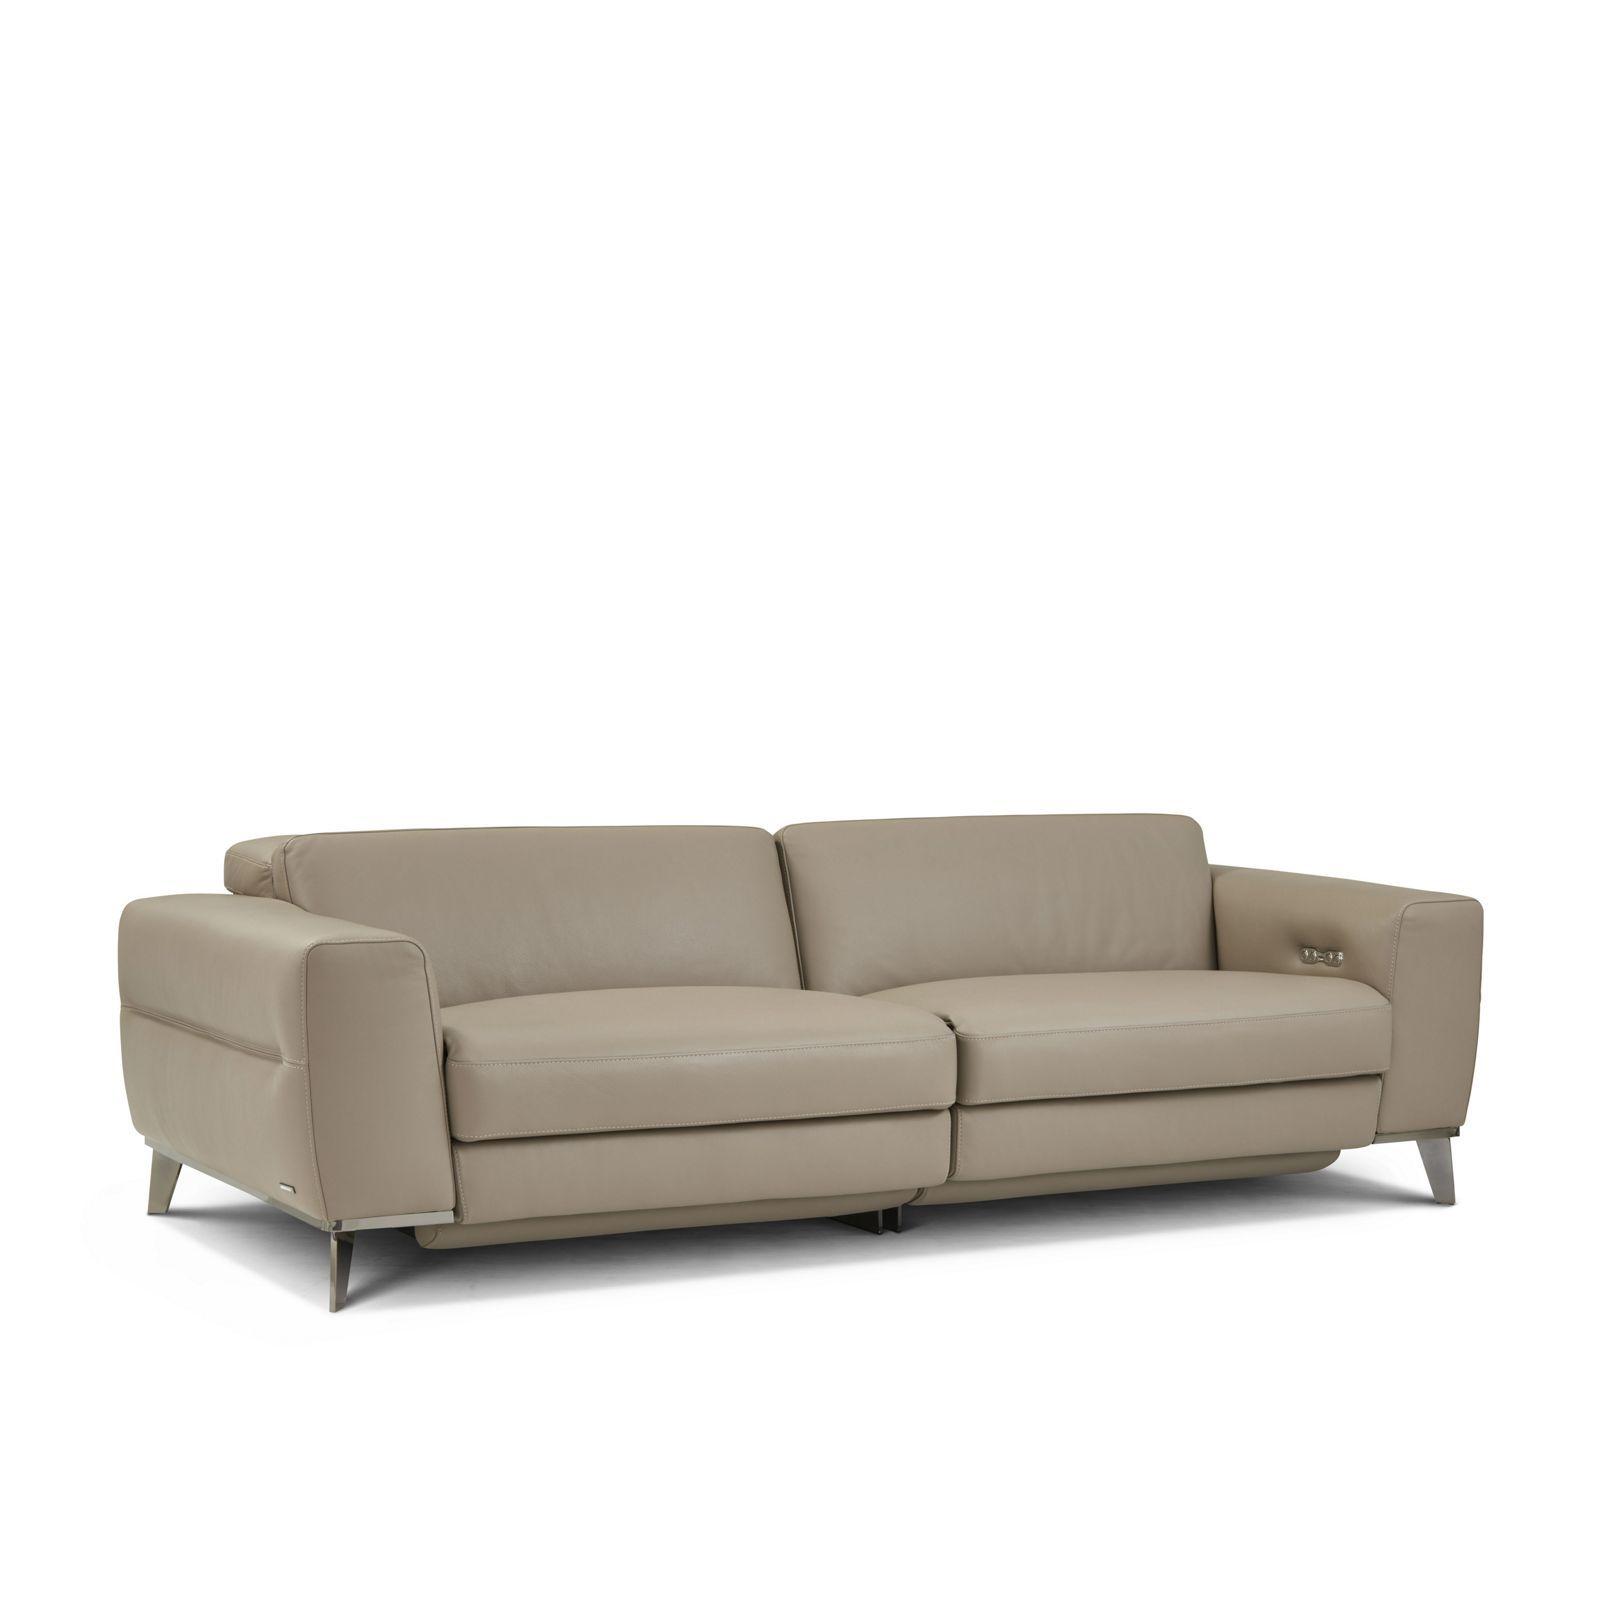 Sofa Sofas Beds Roche Bobois